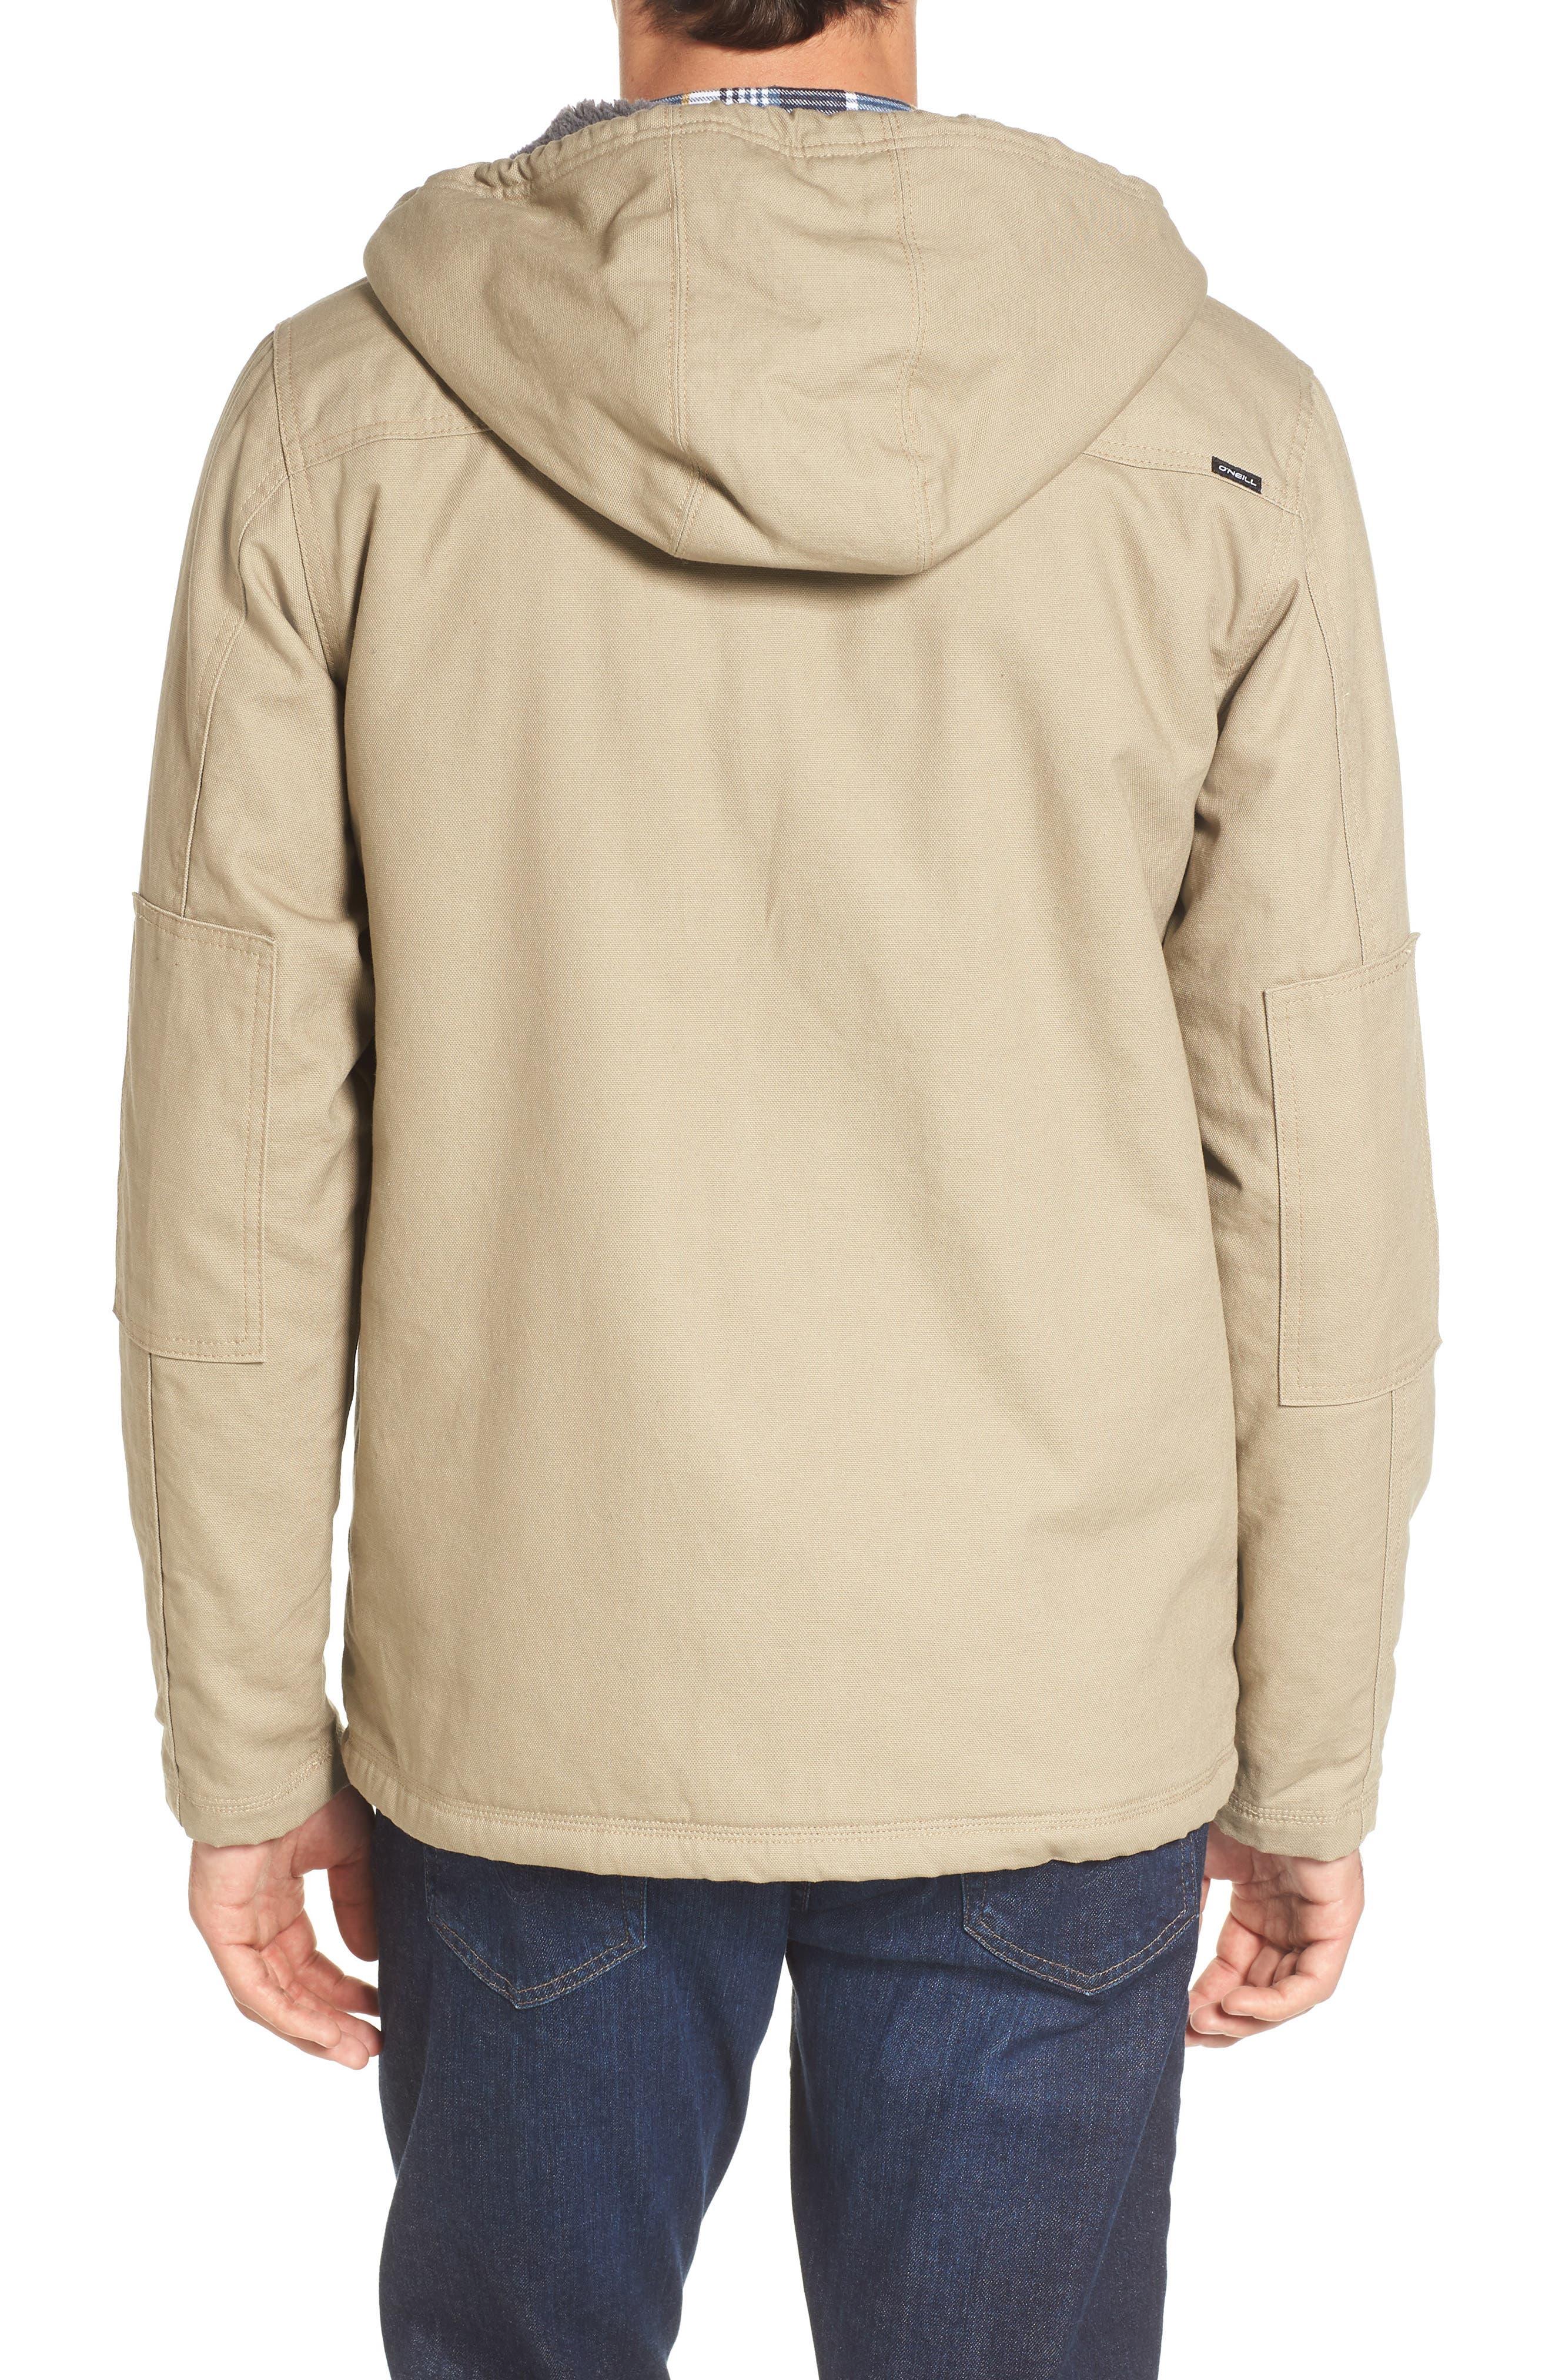 Colton Faux Shearling Trim Hooded Jacket,                             Alternate thumbnail 2, color,                             251